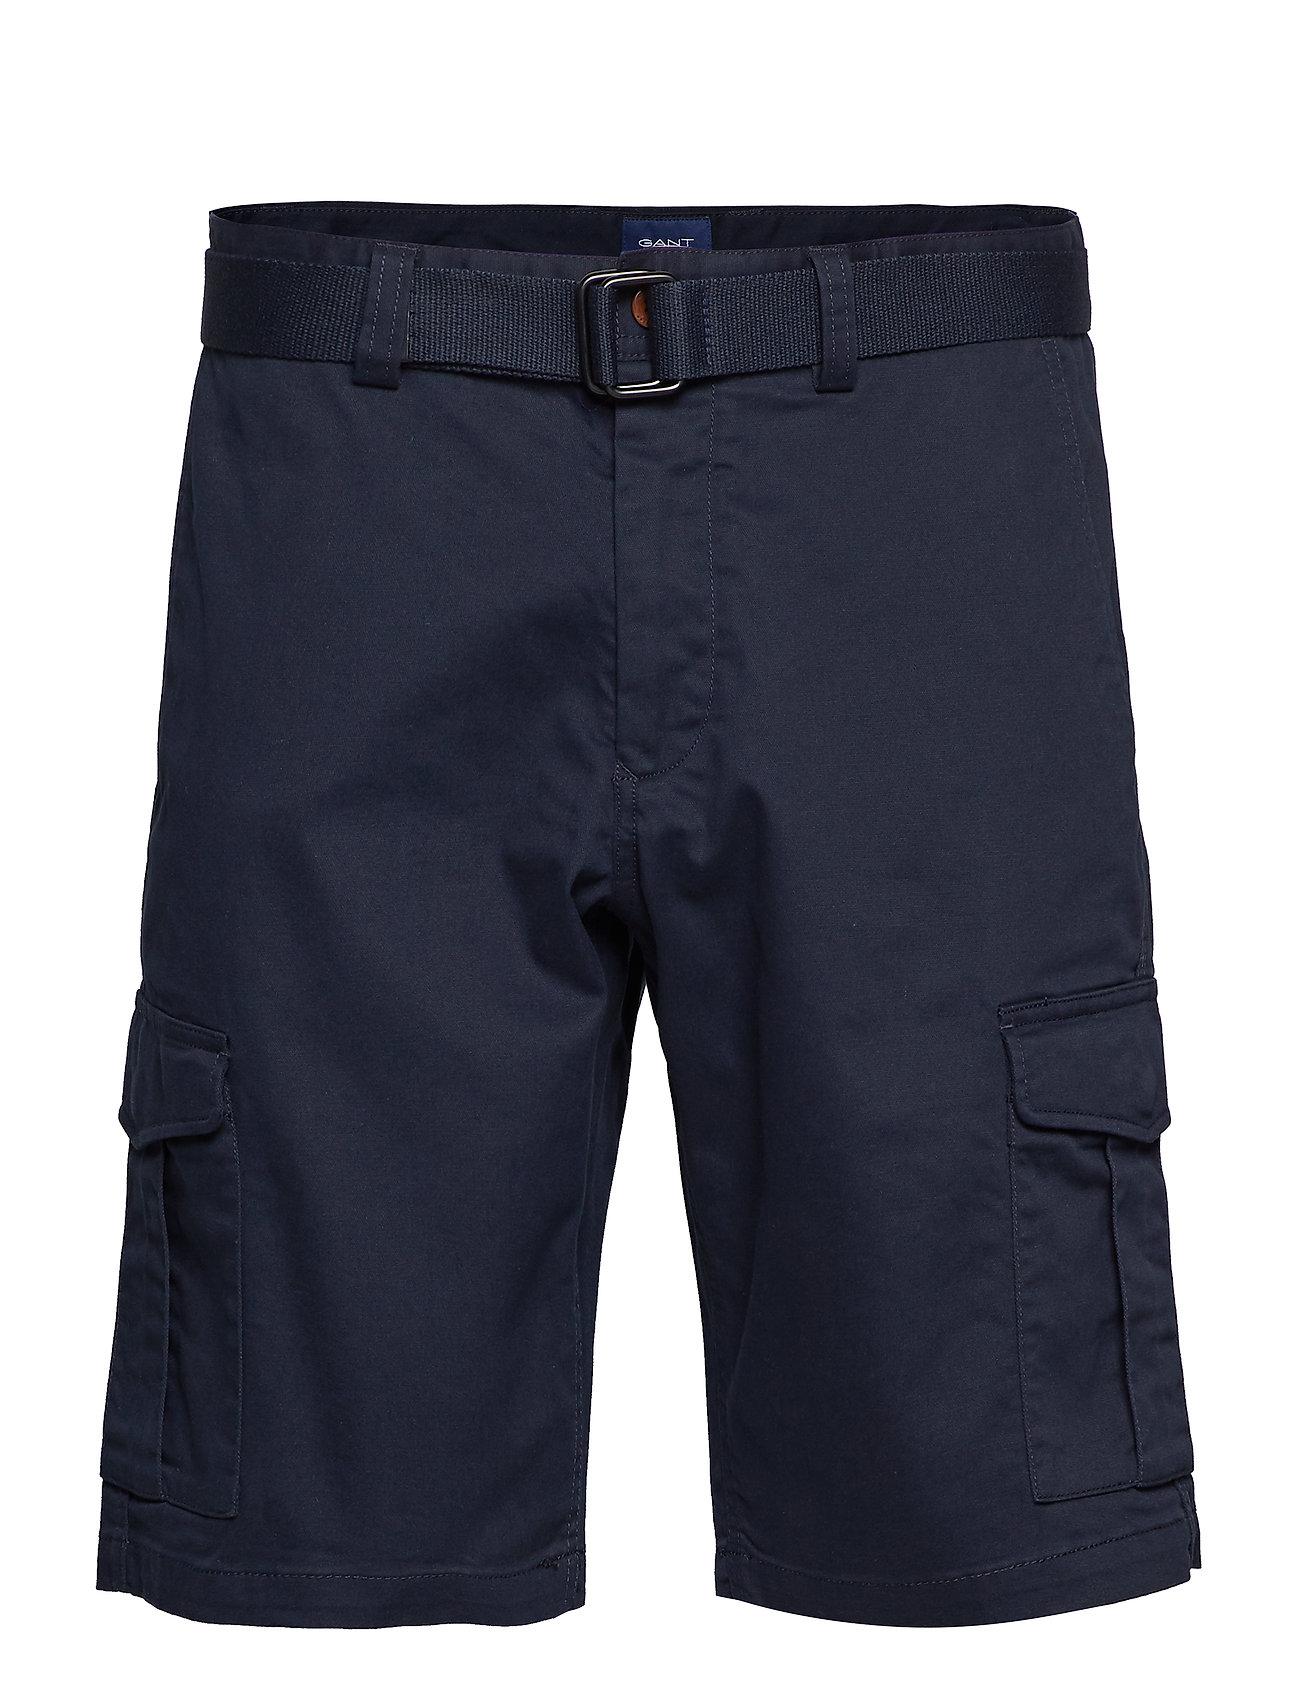 Timberland Logo Box Shorts Herren Grau Mens, Grau